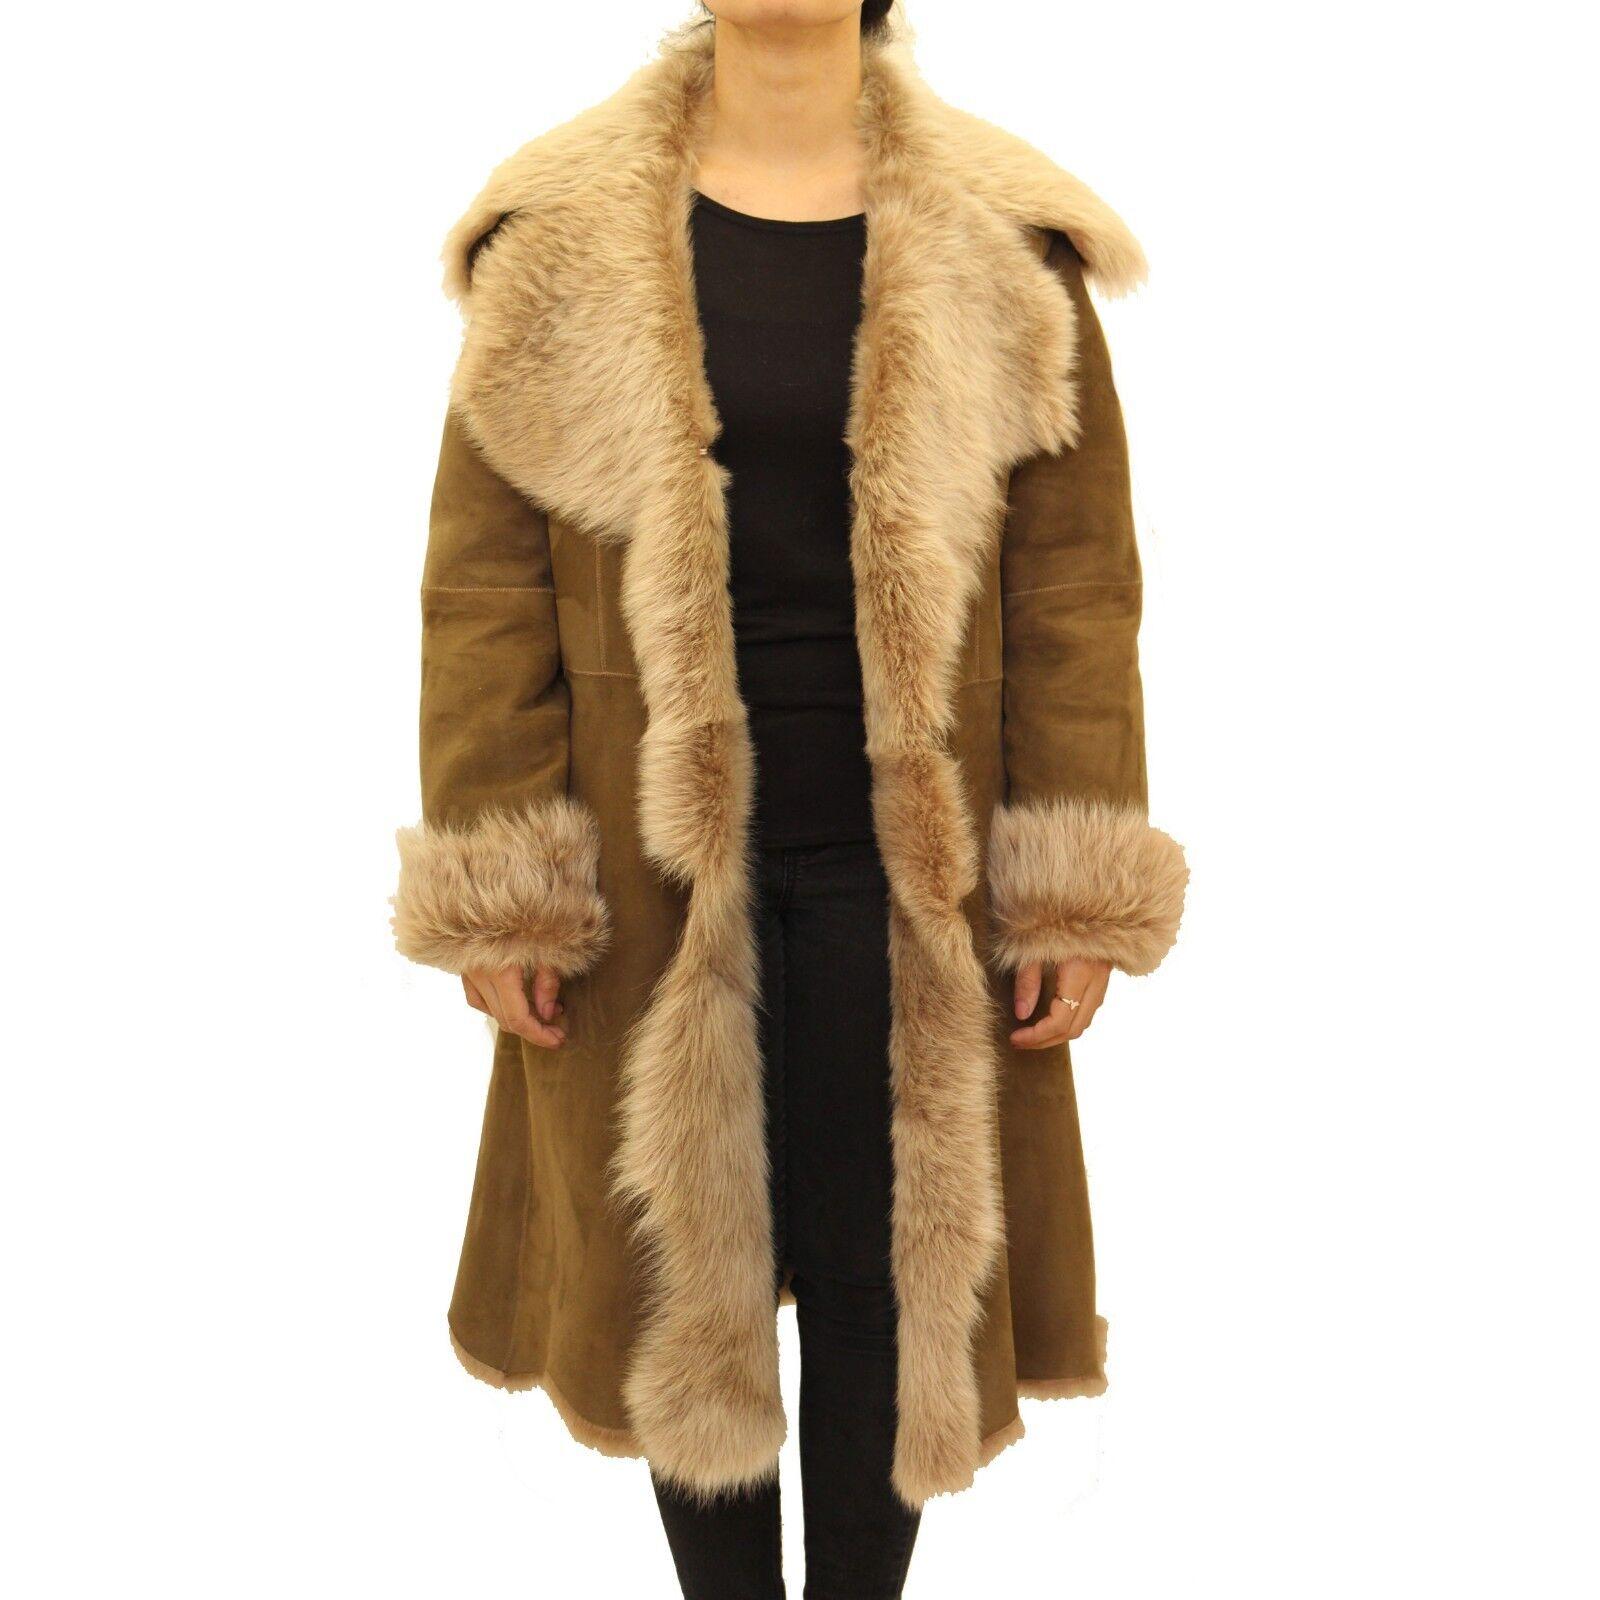 Ladies Tan Brown Toscana Shearling Sheepskin Waterfall Design Warm Winter Coat